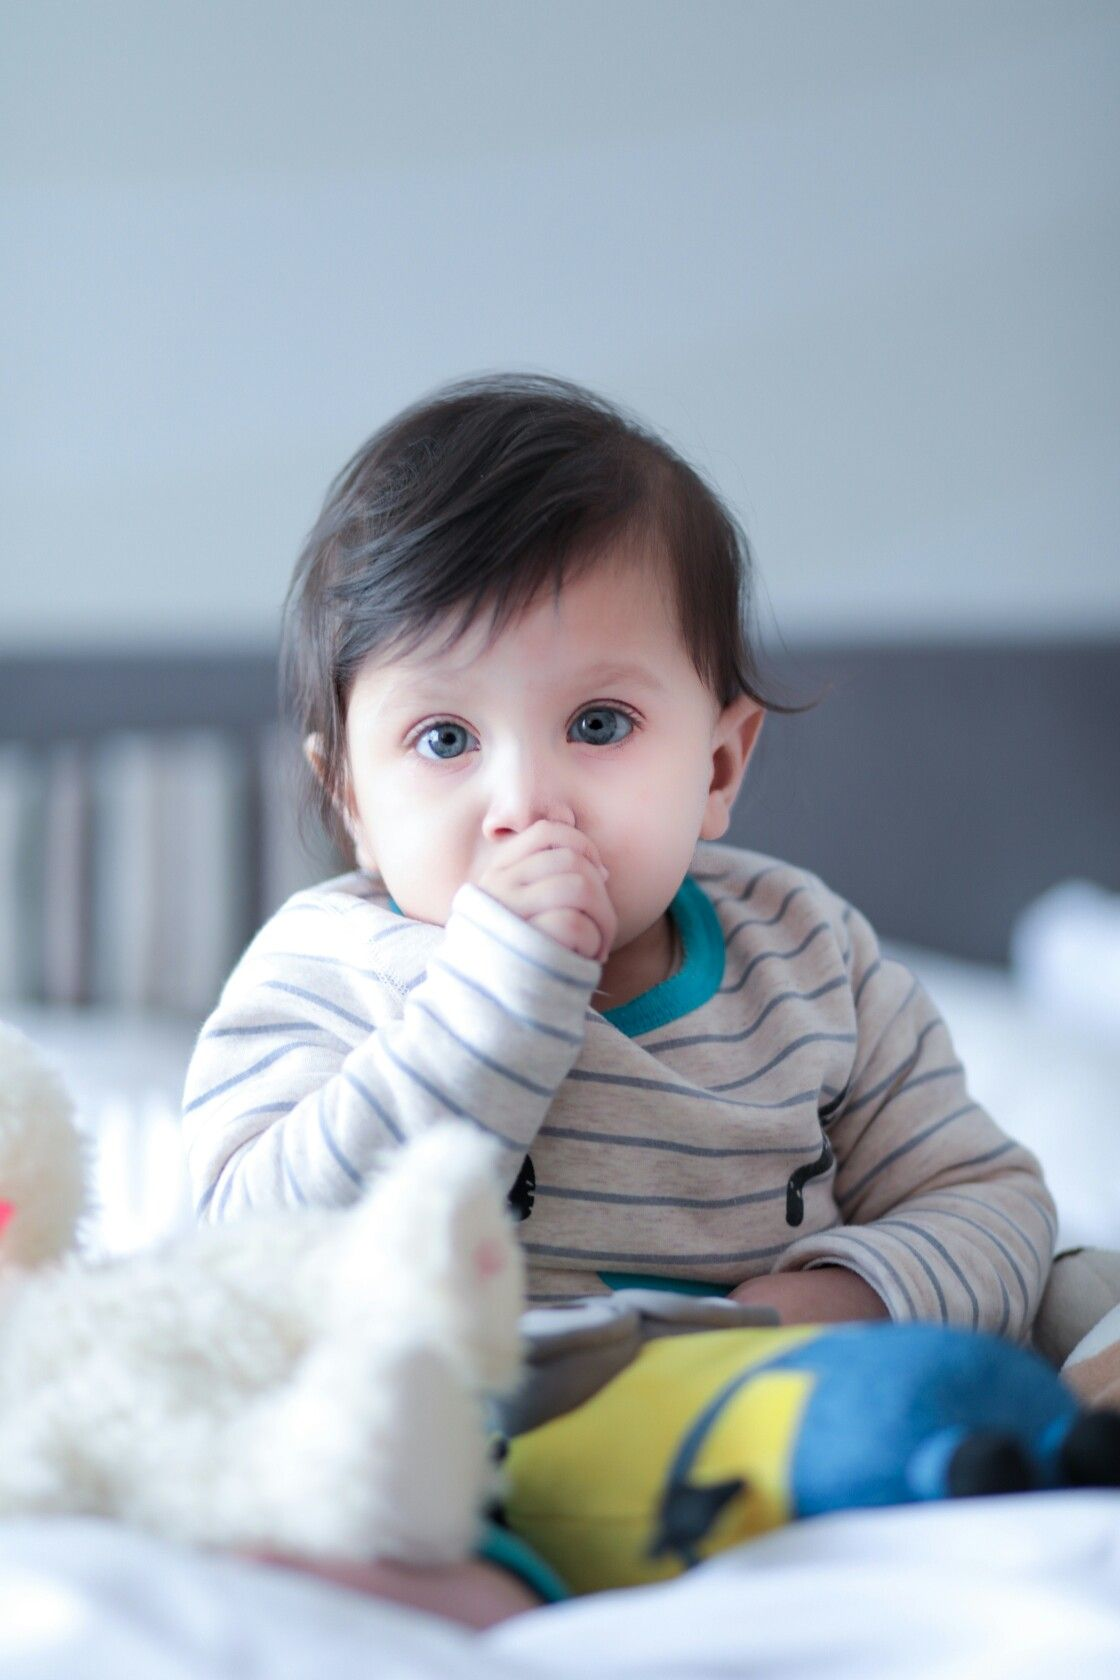 Natural teething remedies baby teething parenting advice kids and parenting mom hacks